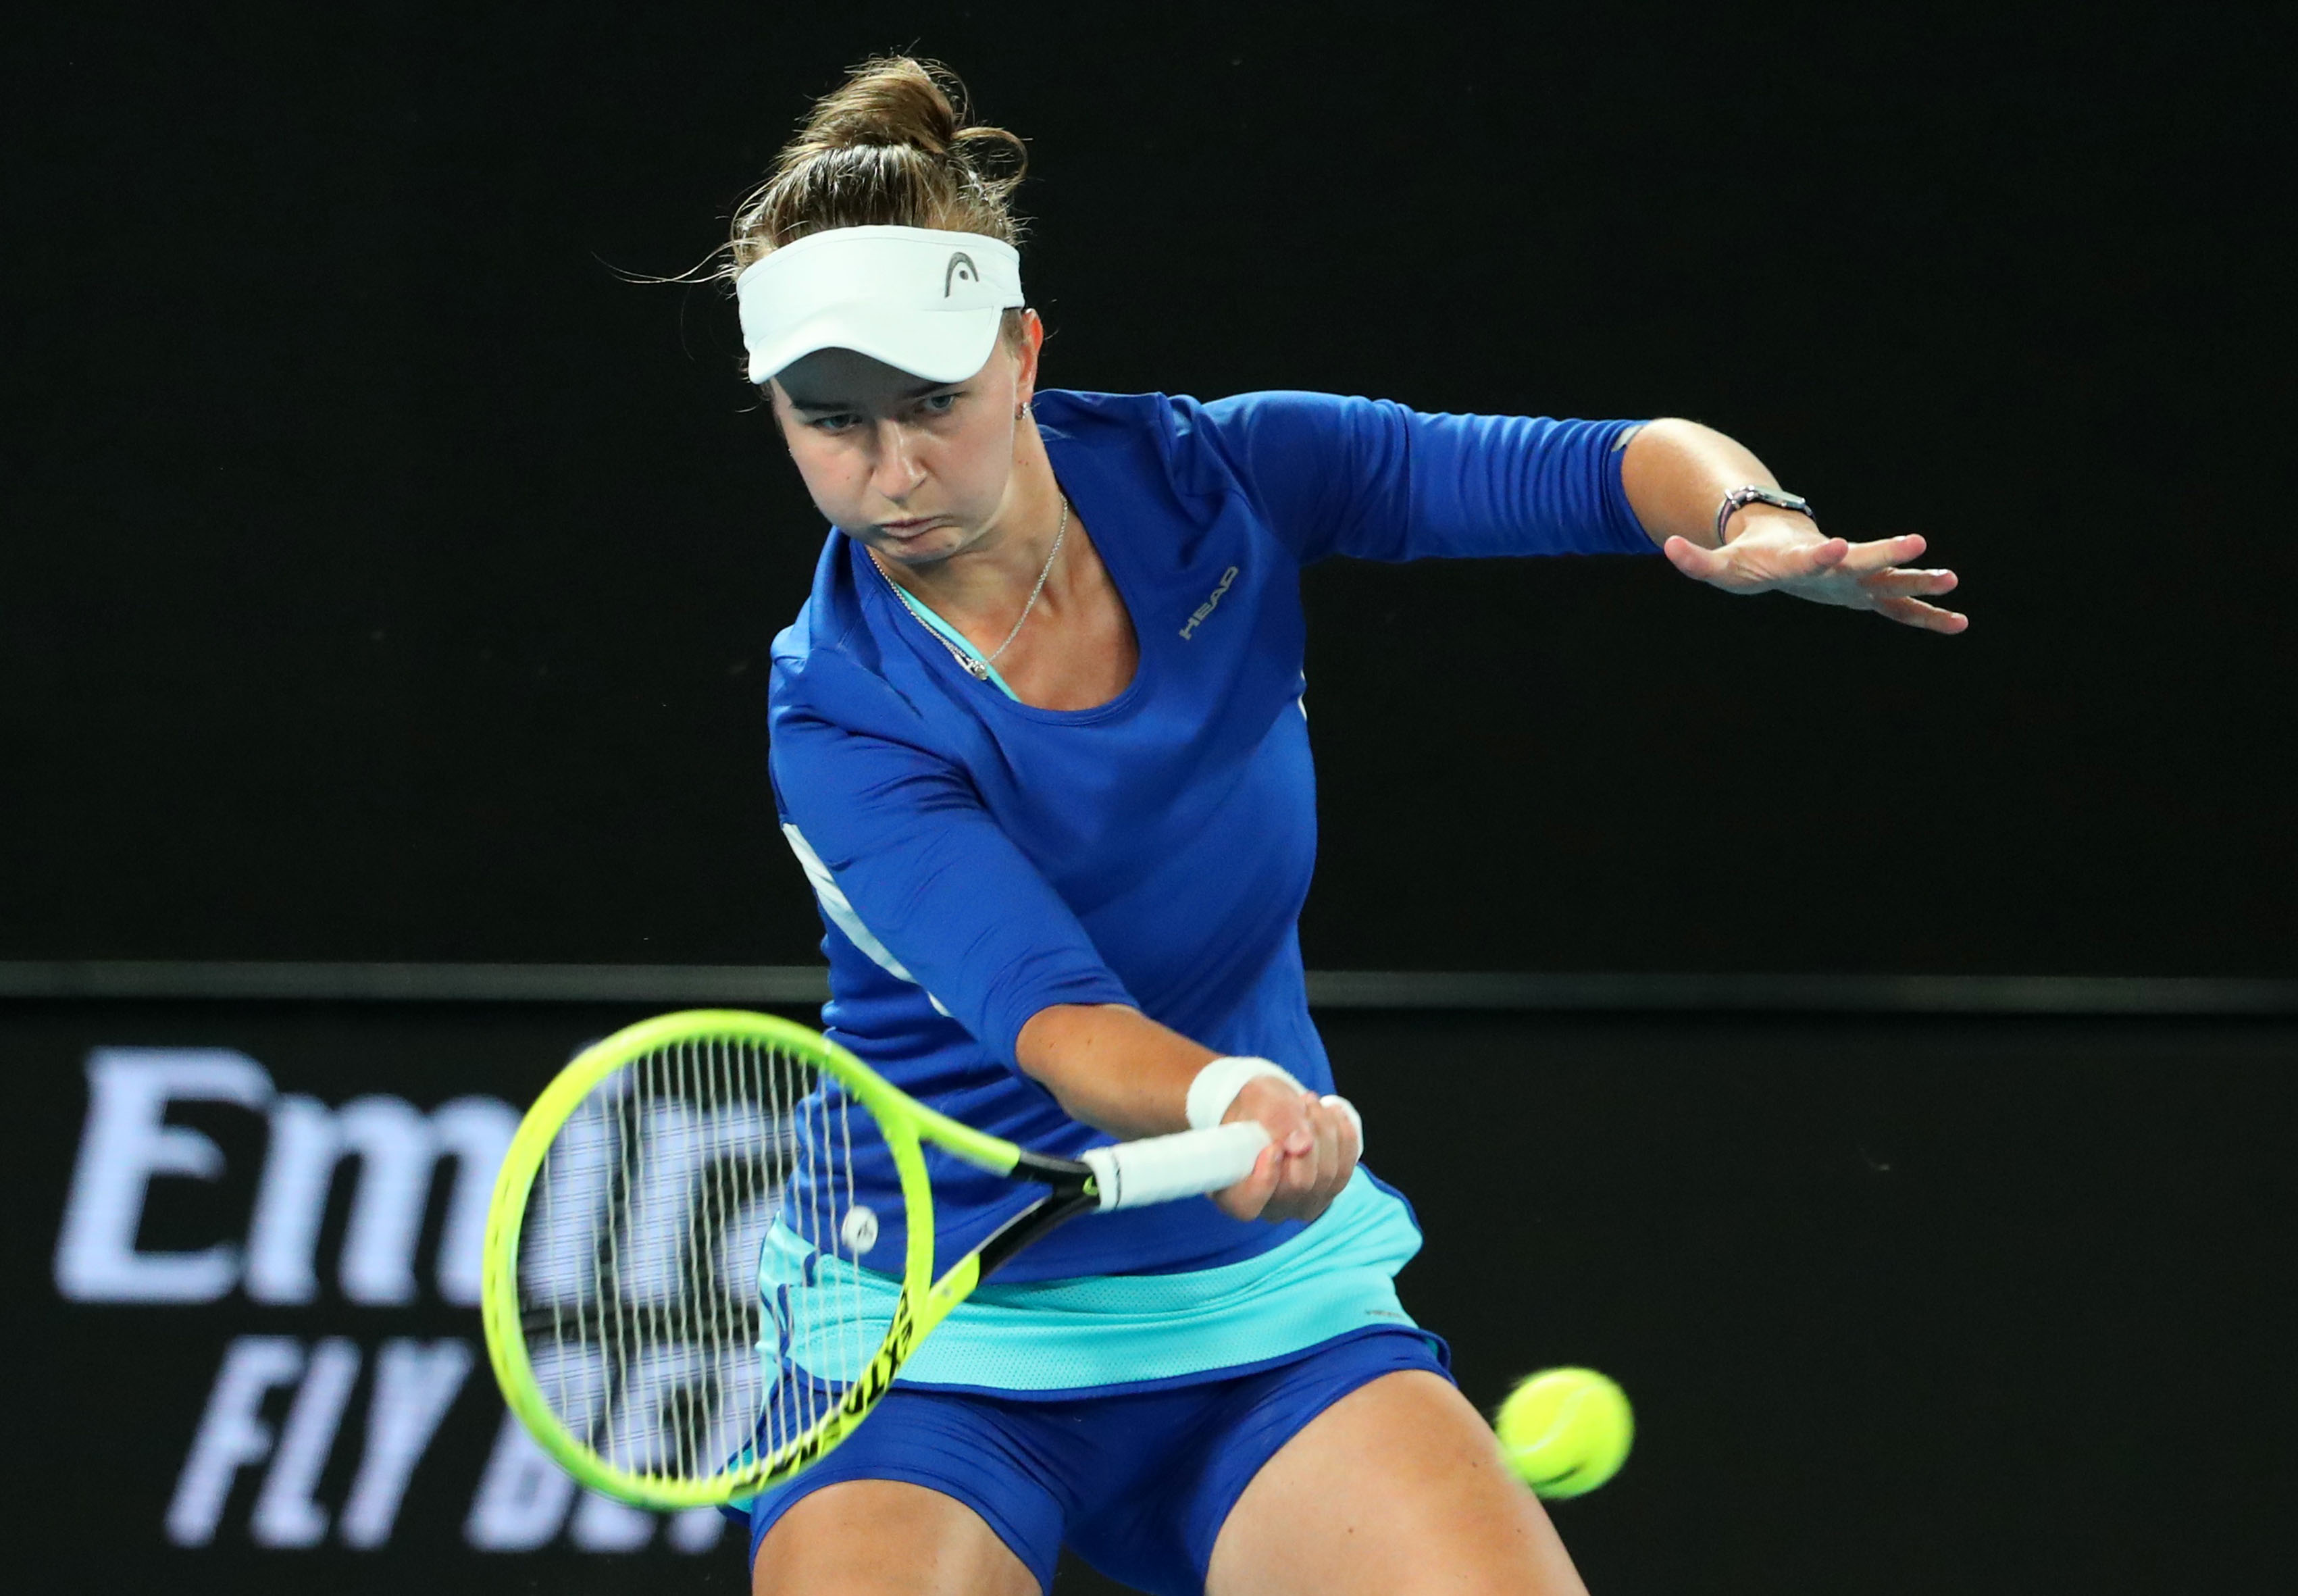 Krejcikova wins maiden WTA title in Strasbourg